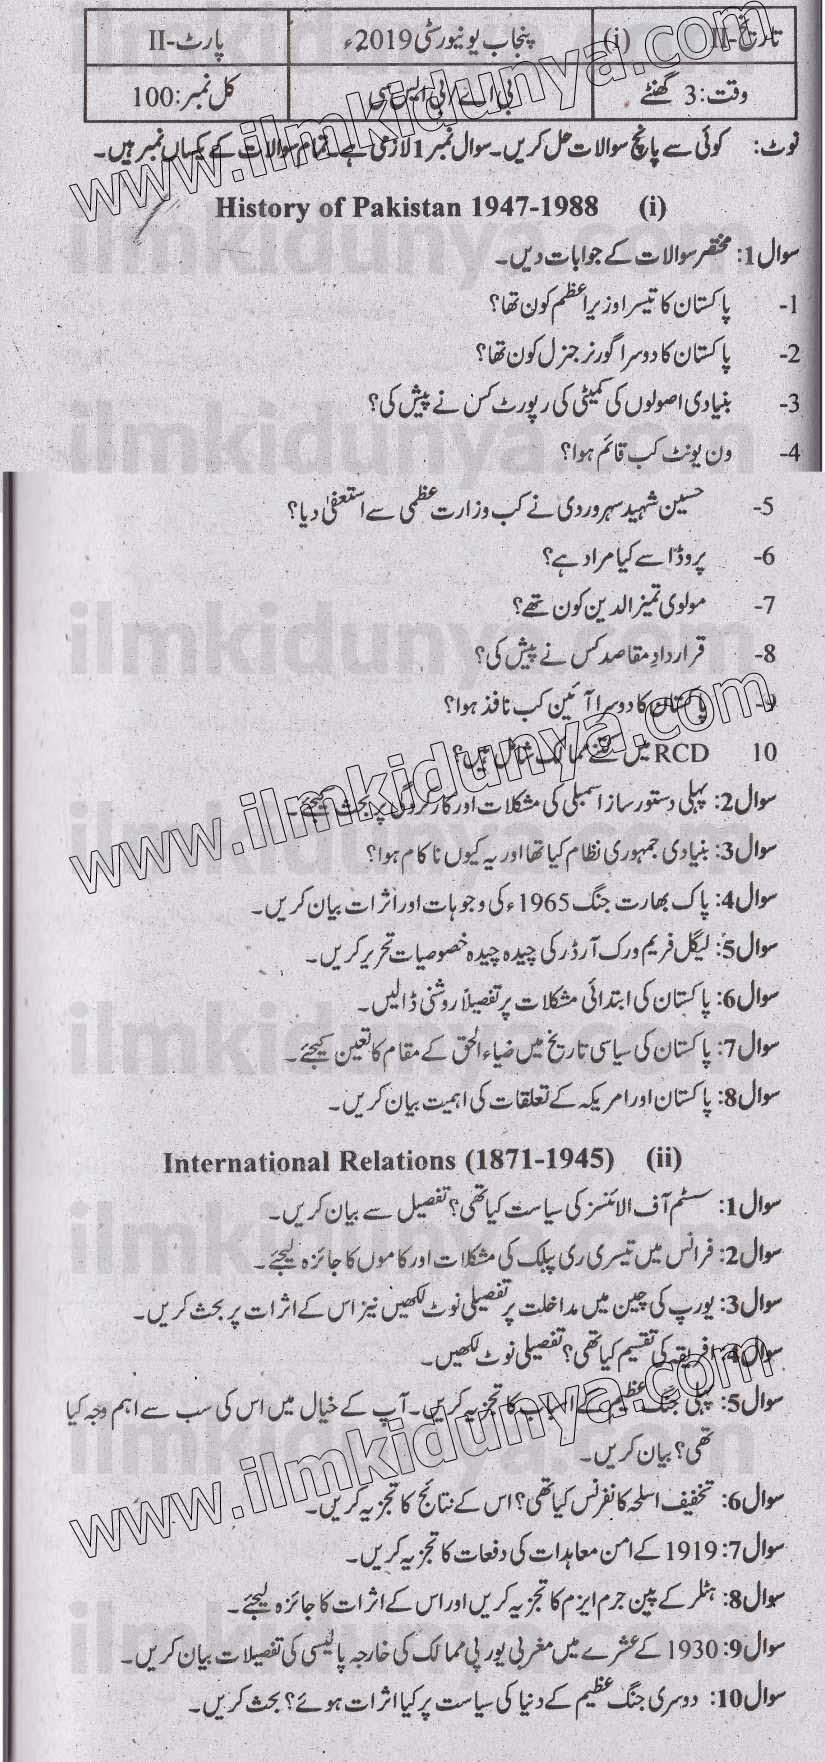 Past Paper 2019 Punjab University B.A Part 2 History II (i